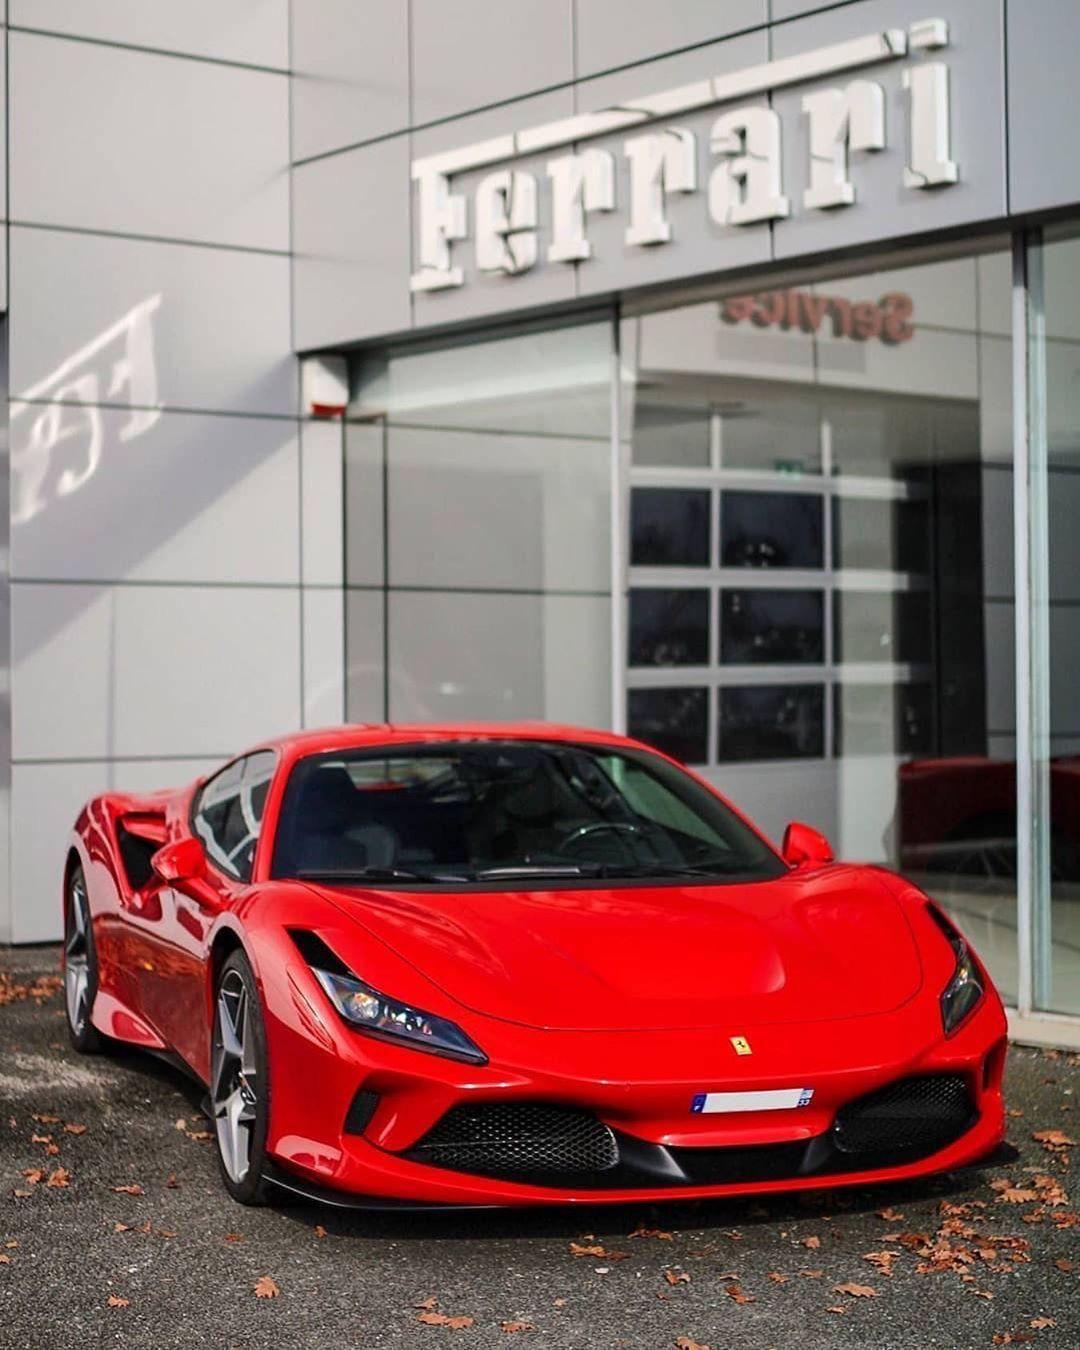 Top Vehicles 2020 Ferrari F8 Tributo Via Reddit In 2020 Ferrari Dream Cars Car